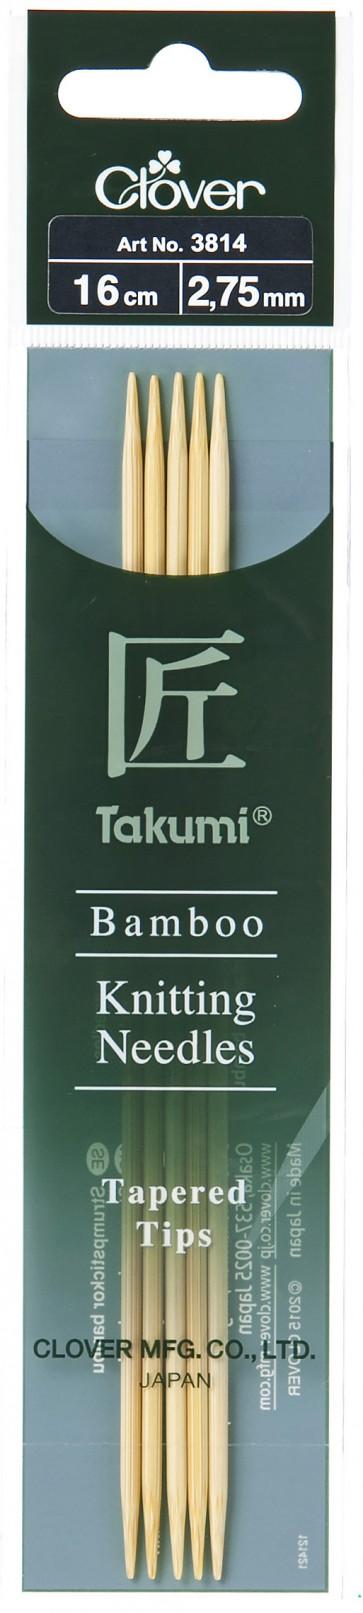 CLOVER Strumpfstrickndl Bambus Takumi 16cm/2.75mm